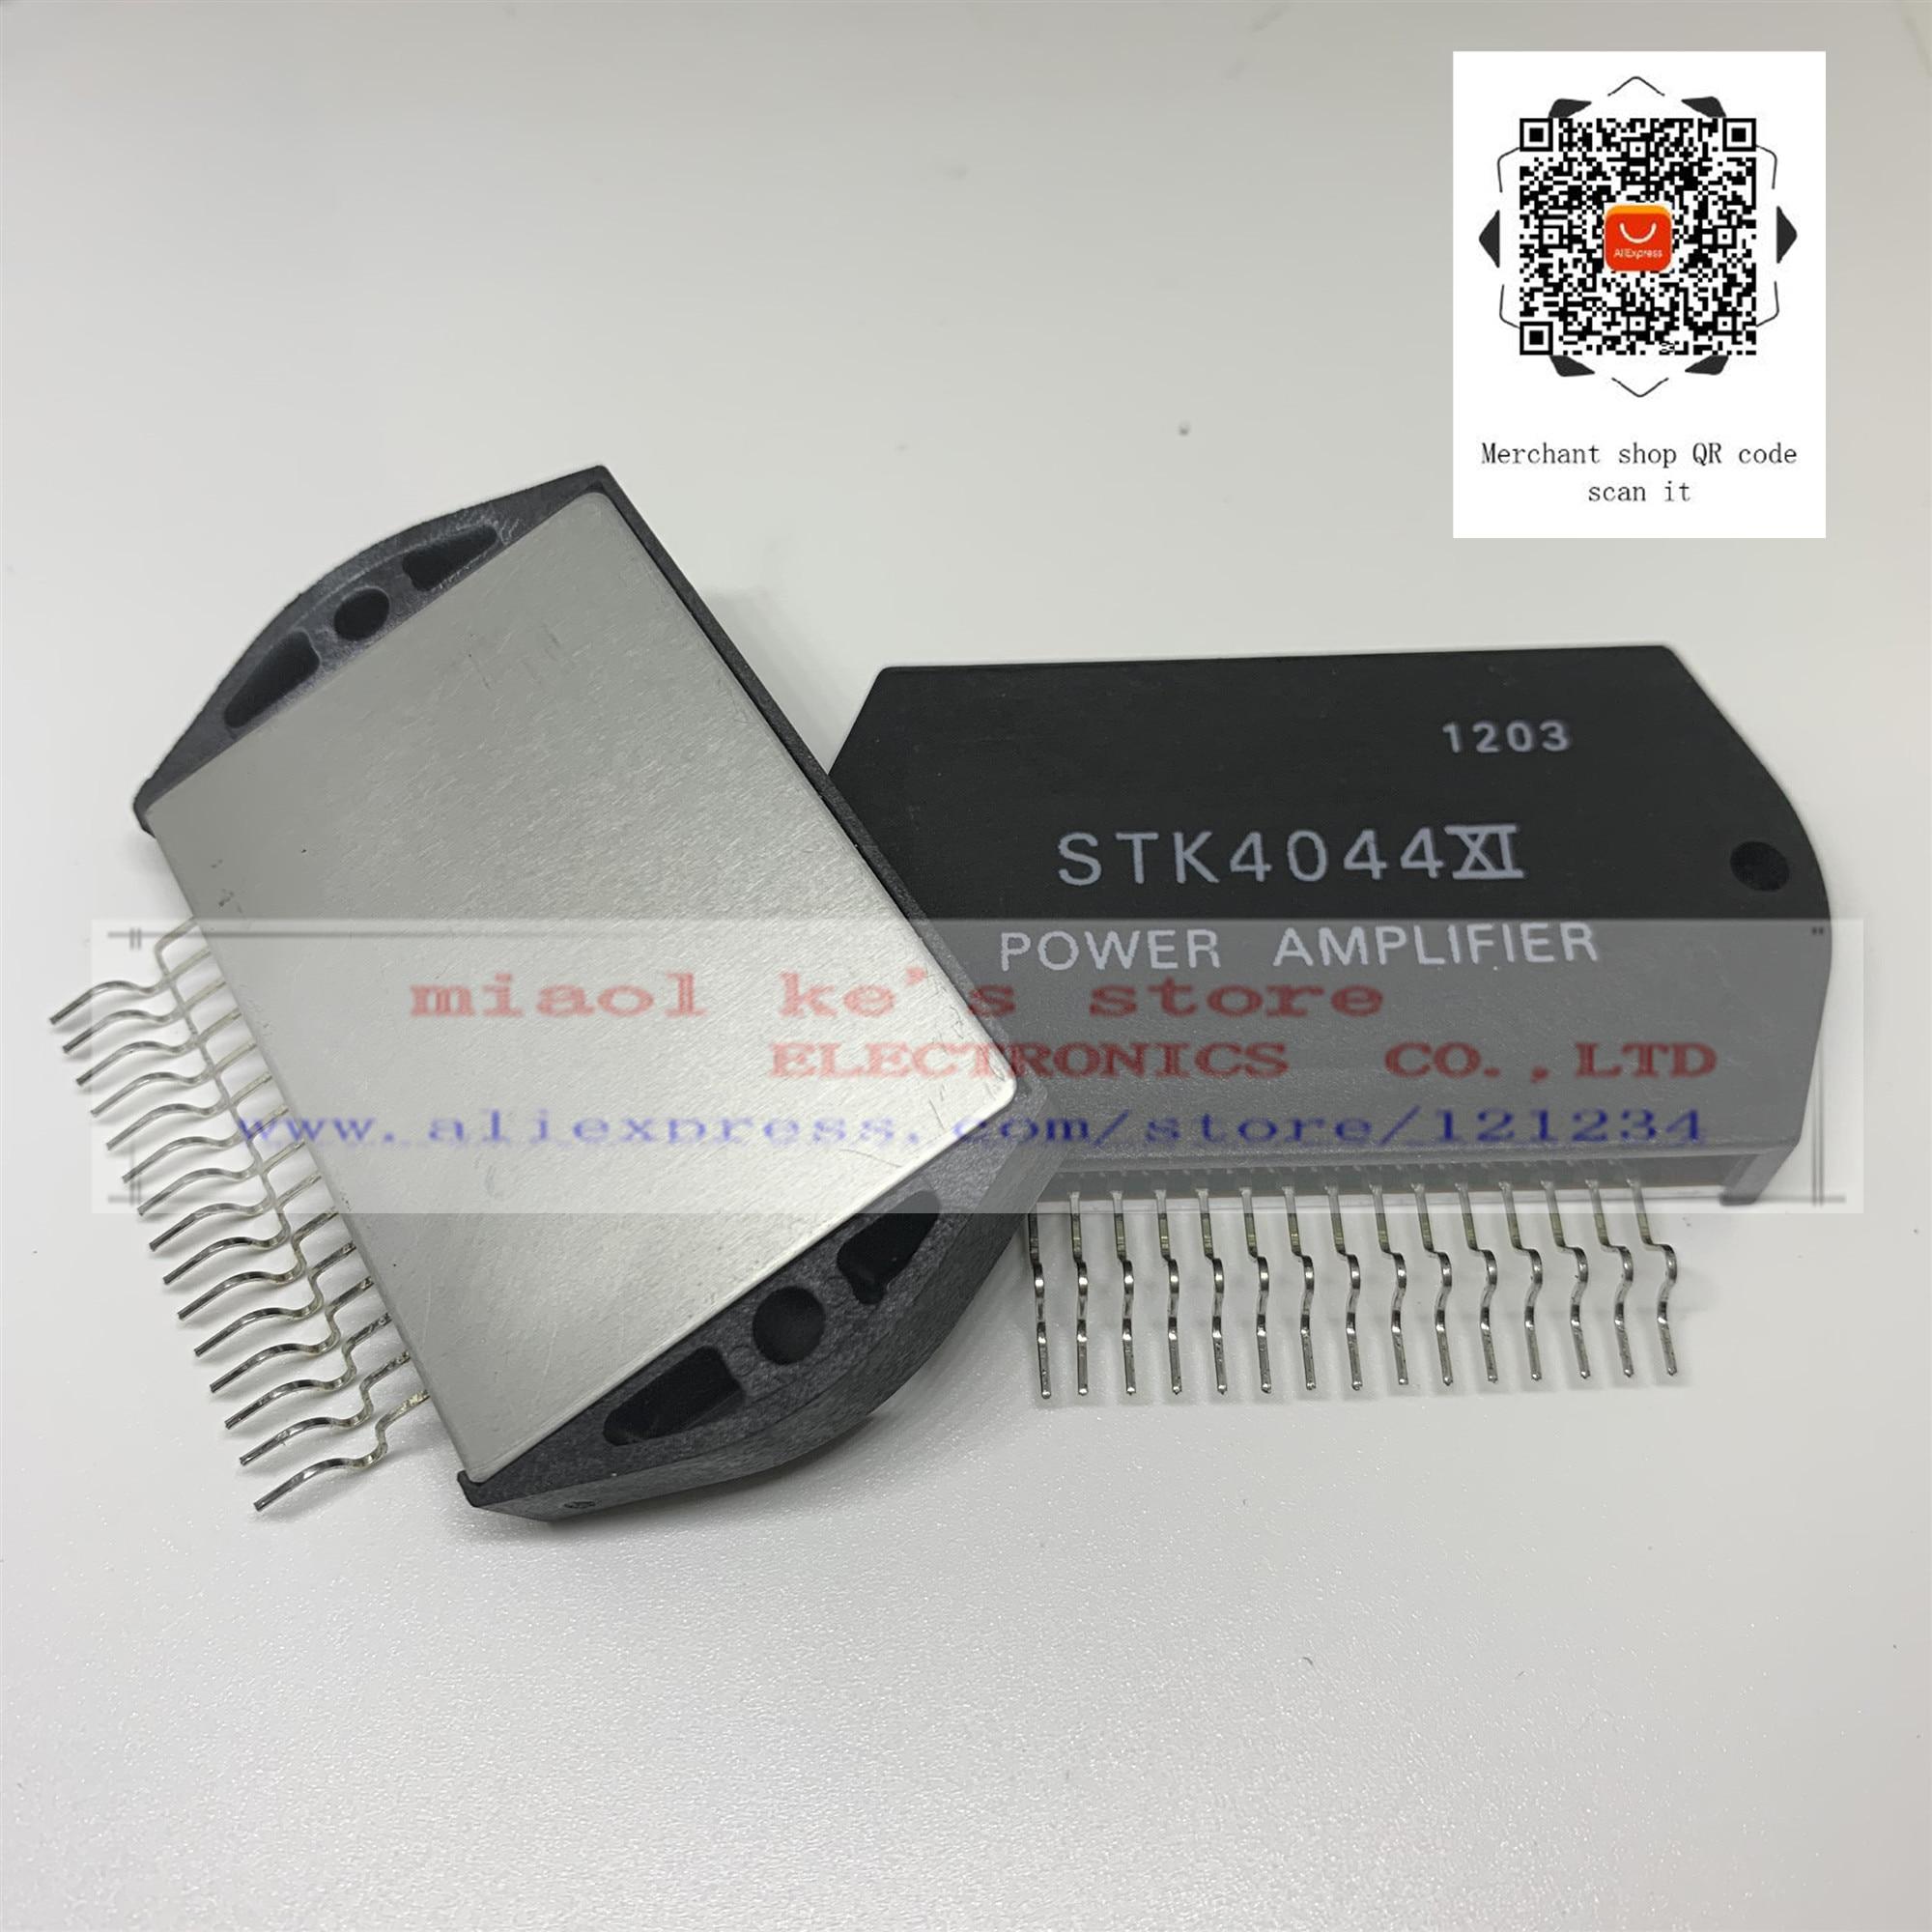 100% original; STK4044XI  STK4044 XI  -  AF Power Amplifier (Split Power Supply) (100 W min, THD = 0.008%)